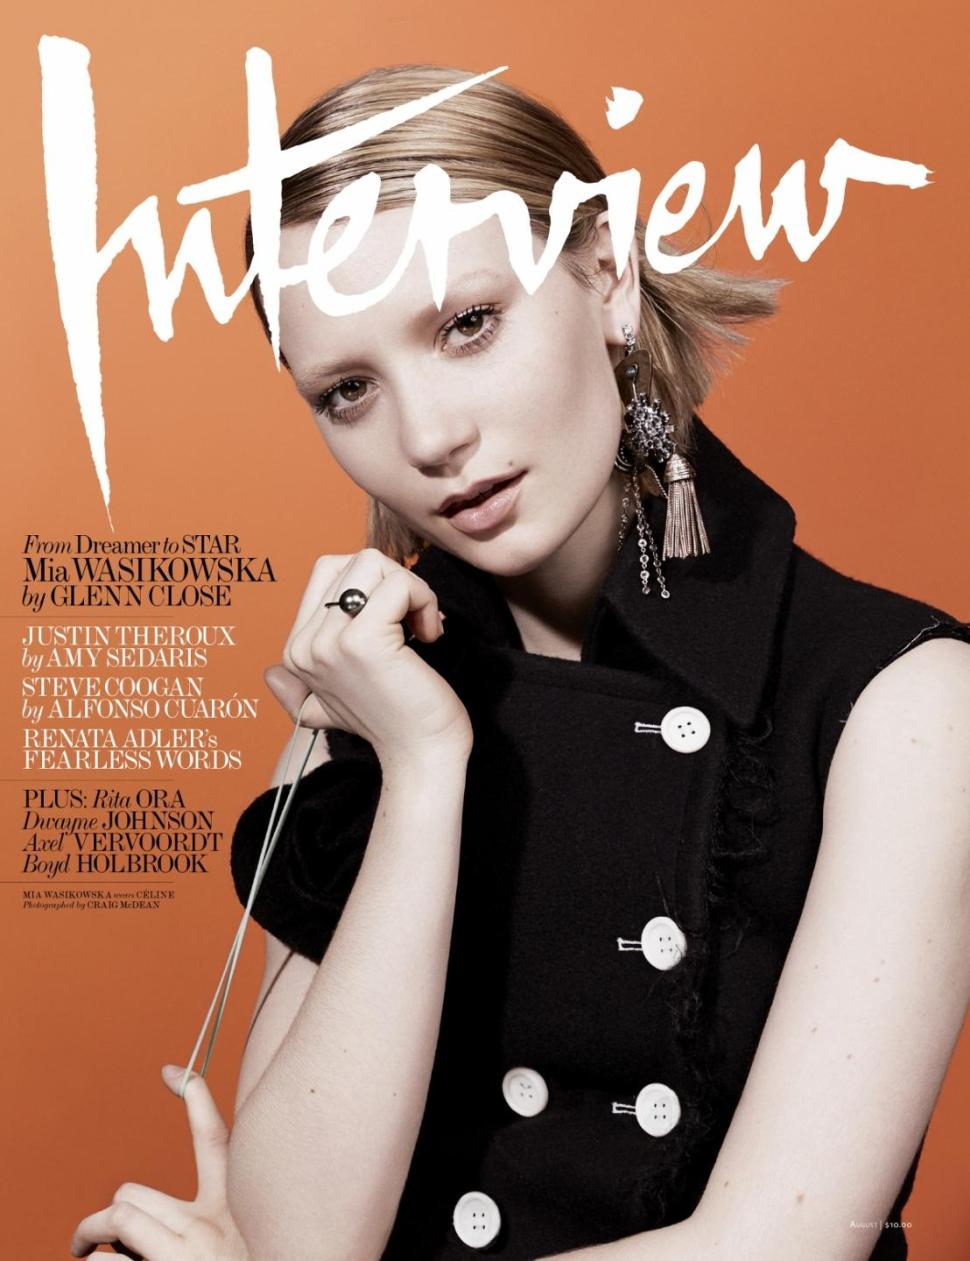 mia-wasikowska-interview-magazine-august-2014.jpg